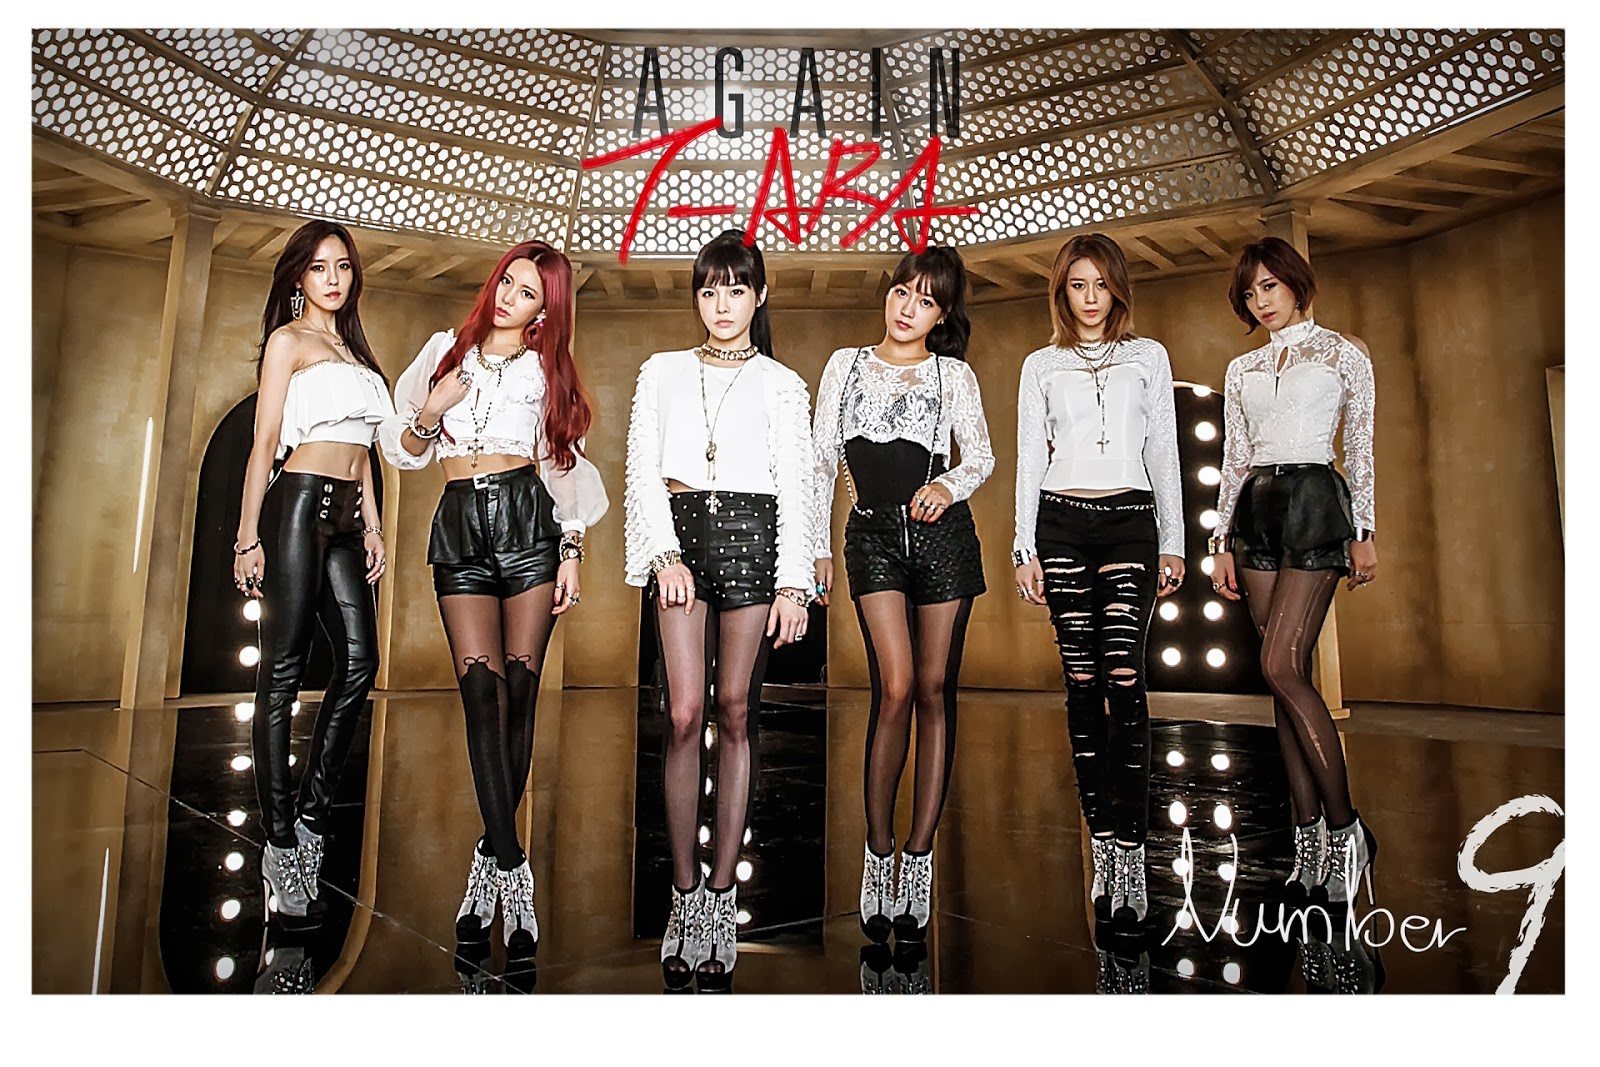 Kpop erotic version 9 poket girls 3